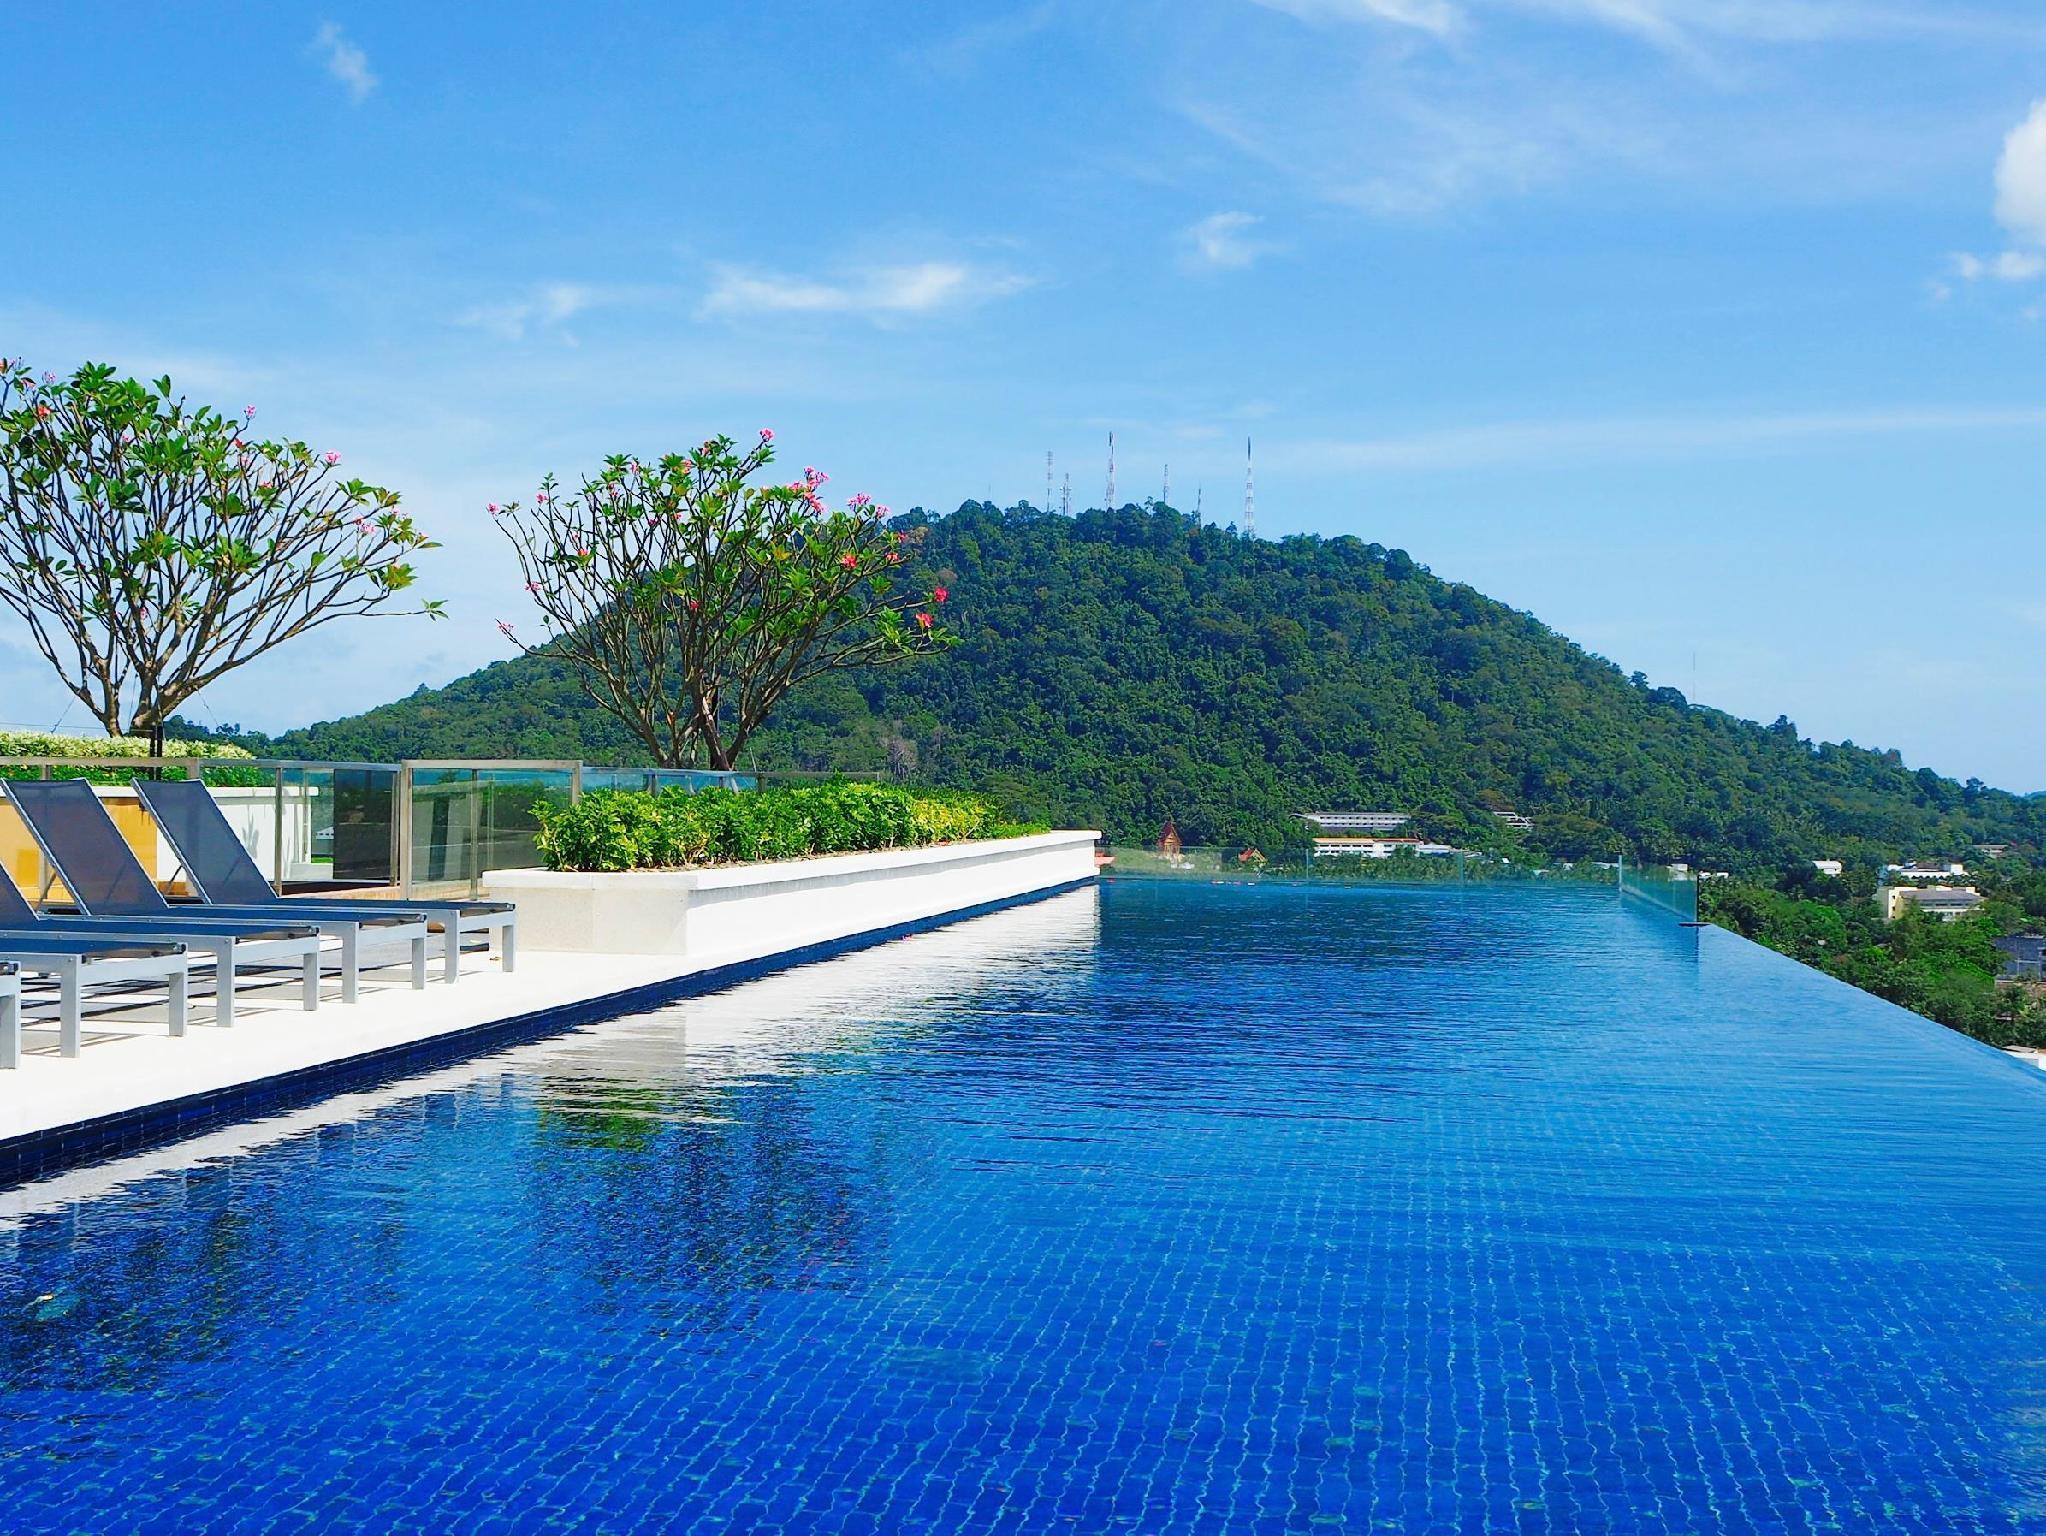 Duplex Height Phuket & Rooftop Swimming Pool Duplex Height Phuket & Rooftop Swimming Pool